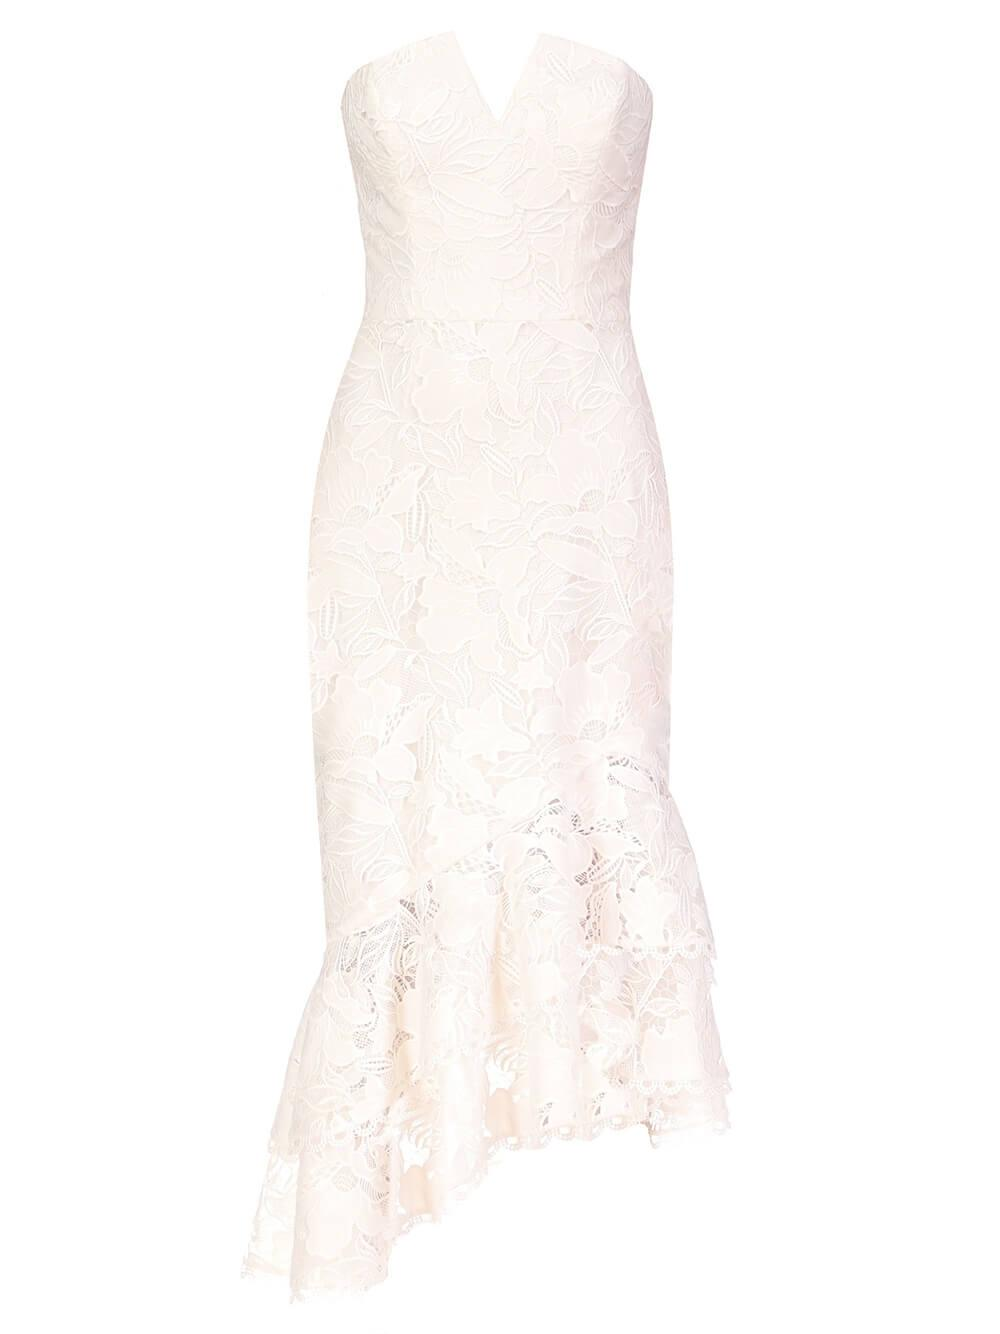 Strapless Mila Dress